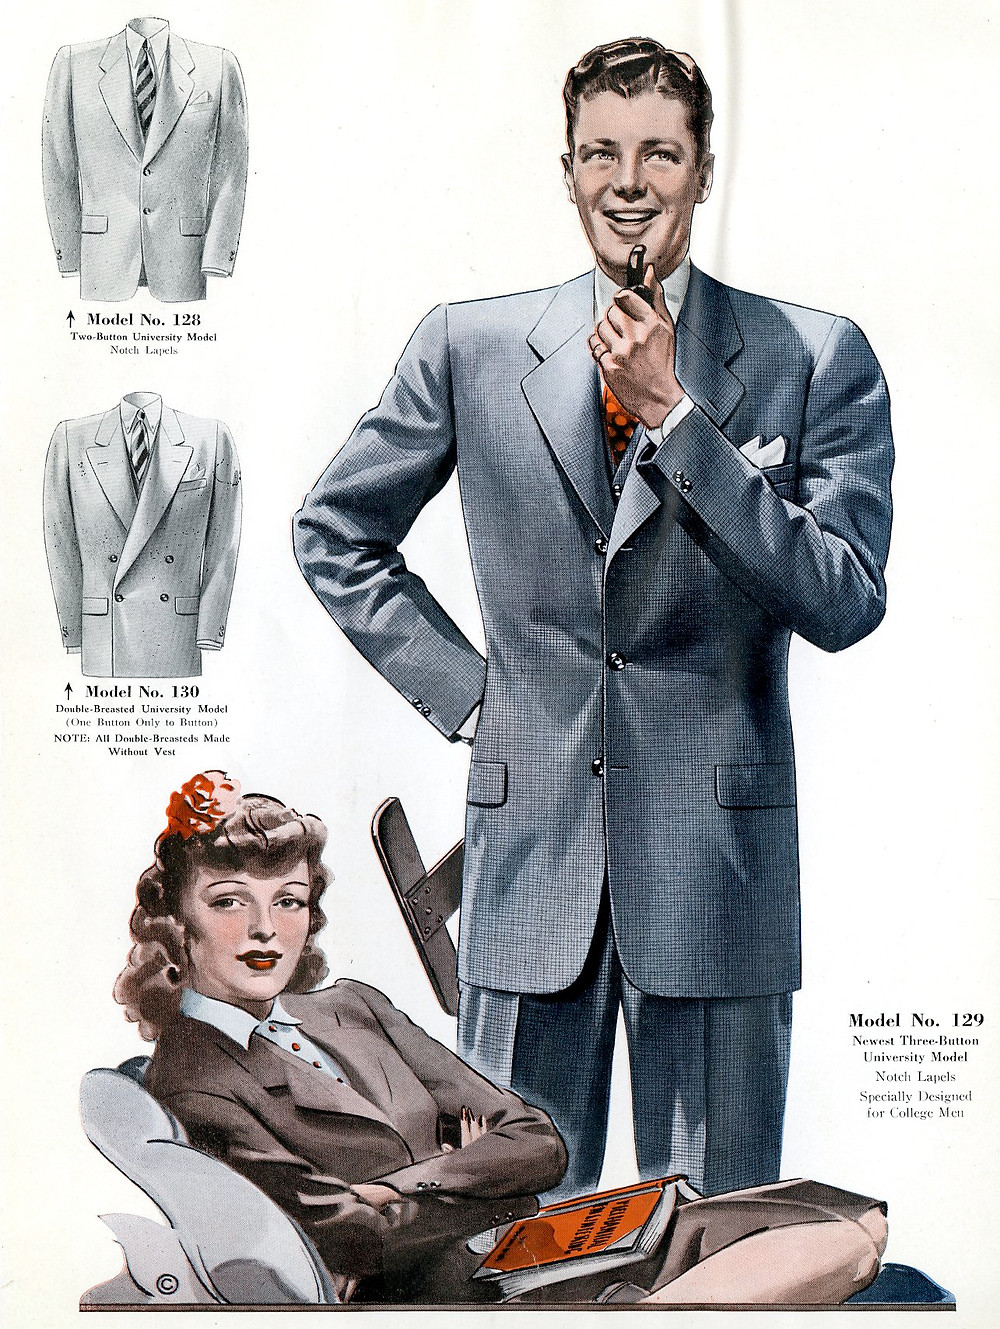 1940s fashion plate